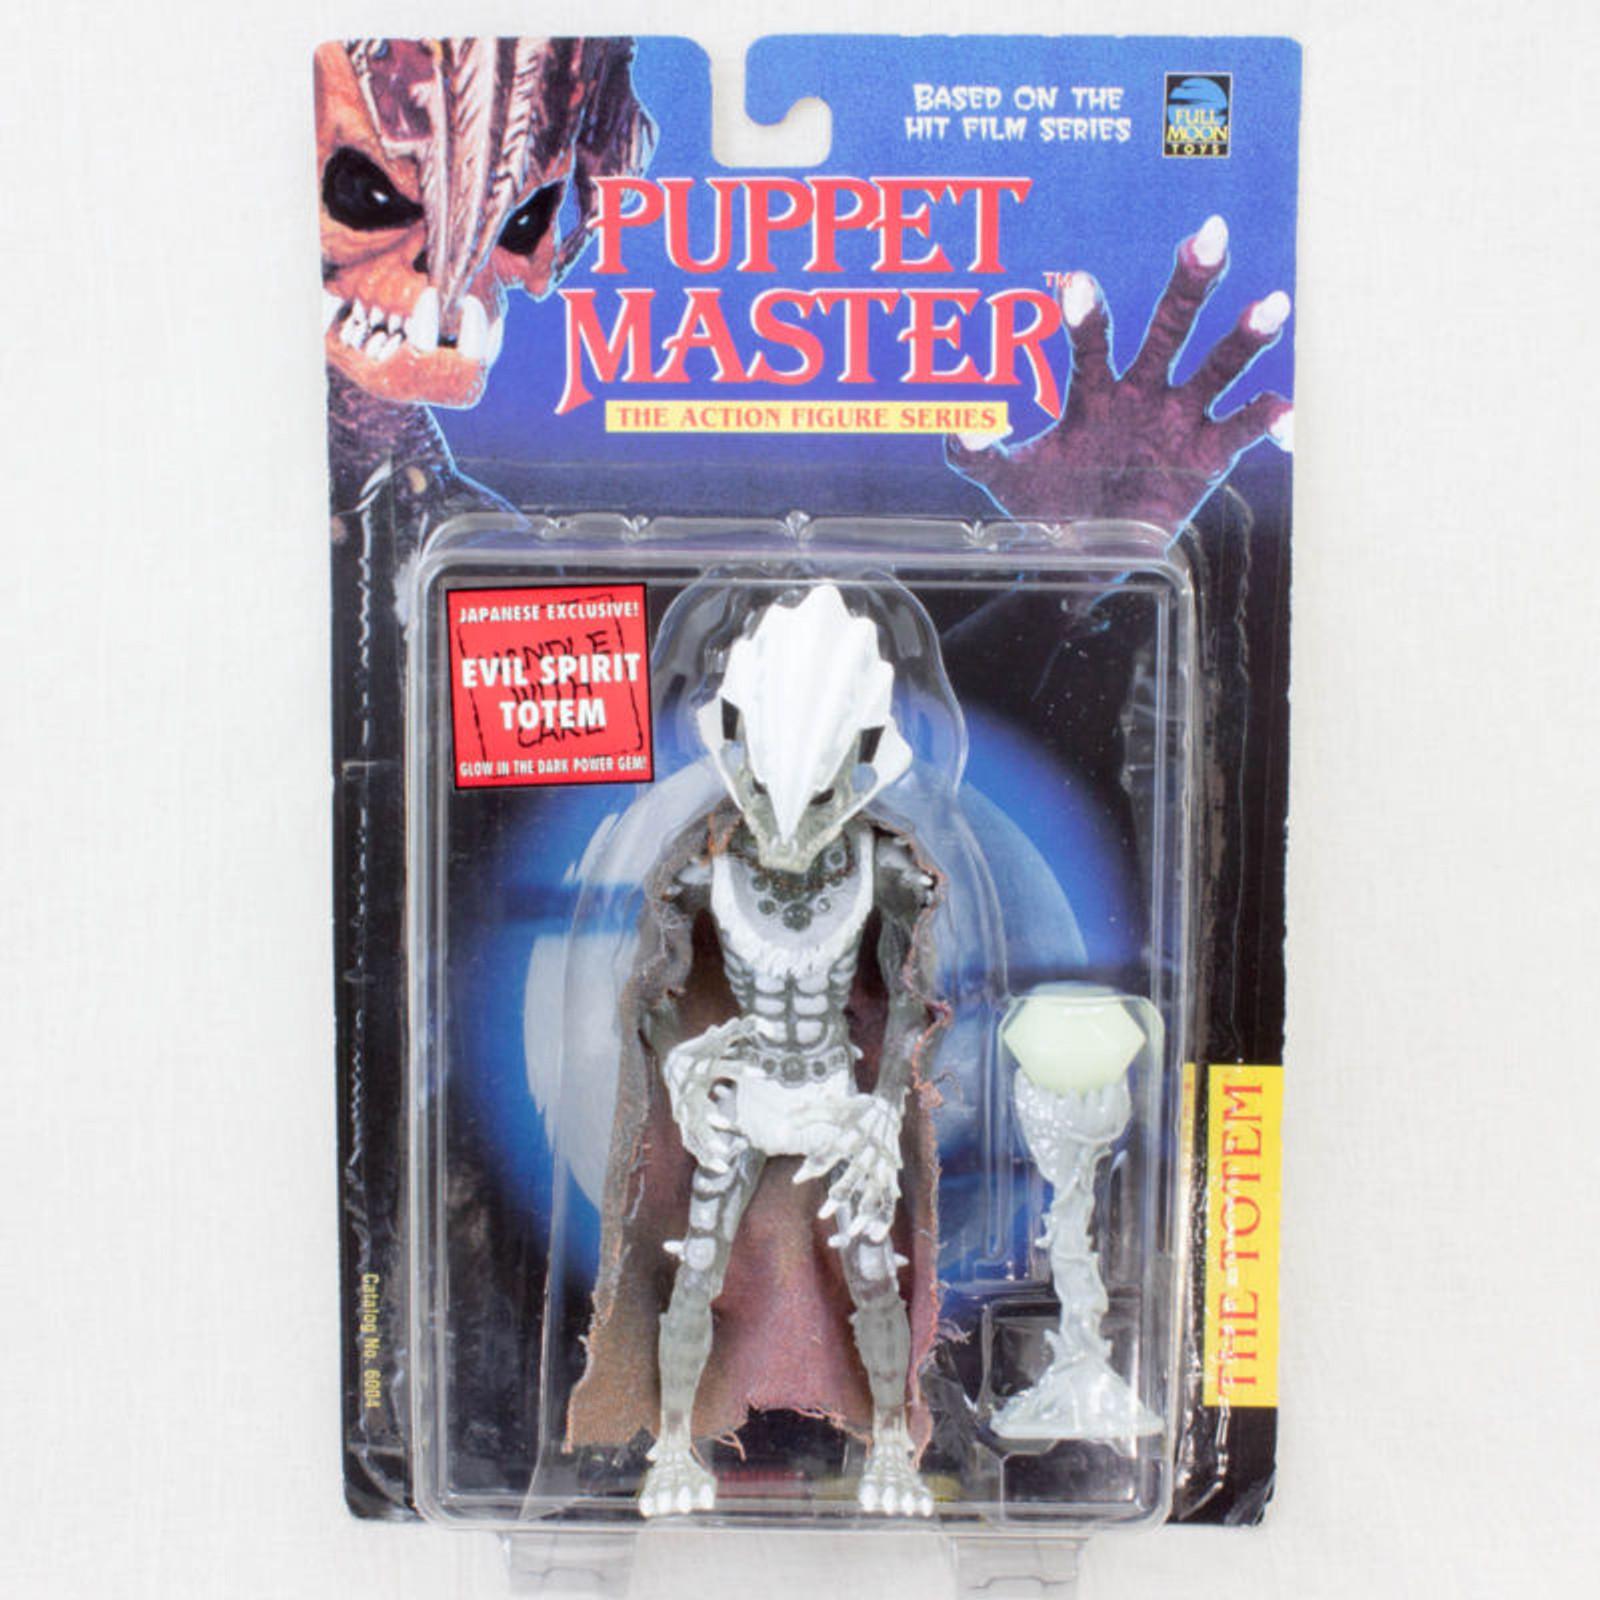 PUPPET MASTER Evil Spirit Totem Figure Japanese Exclusive Full Moon Toys